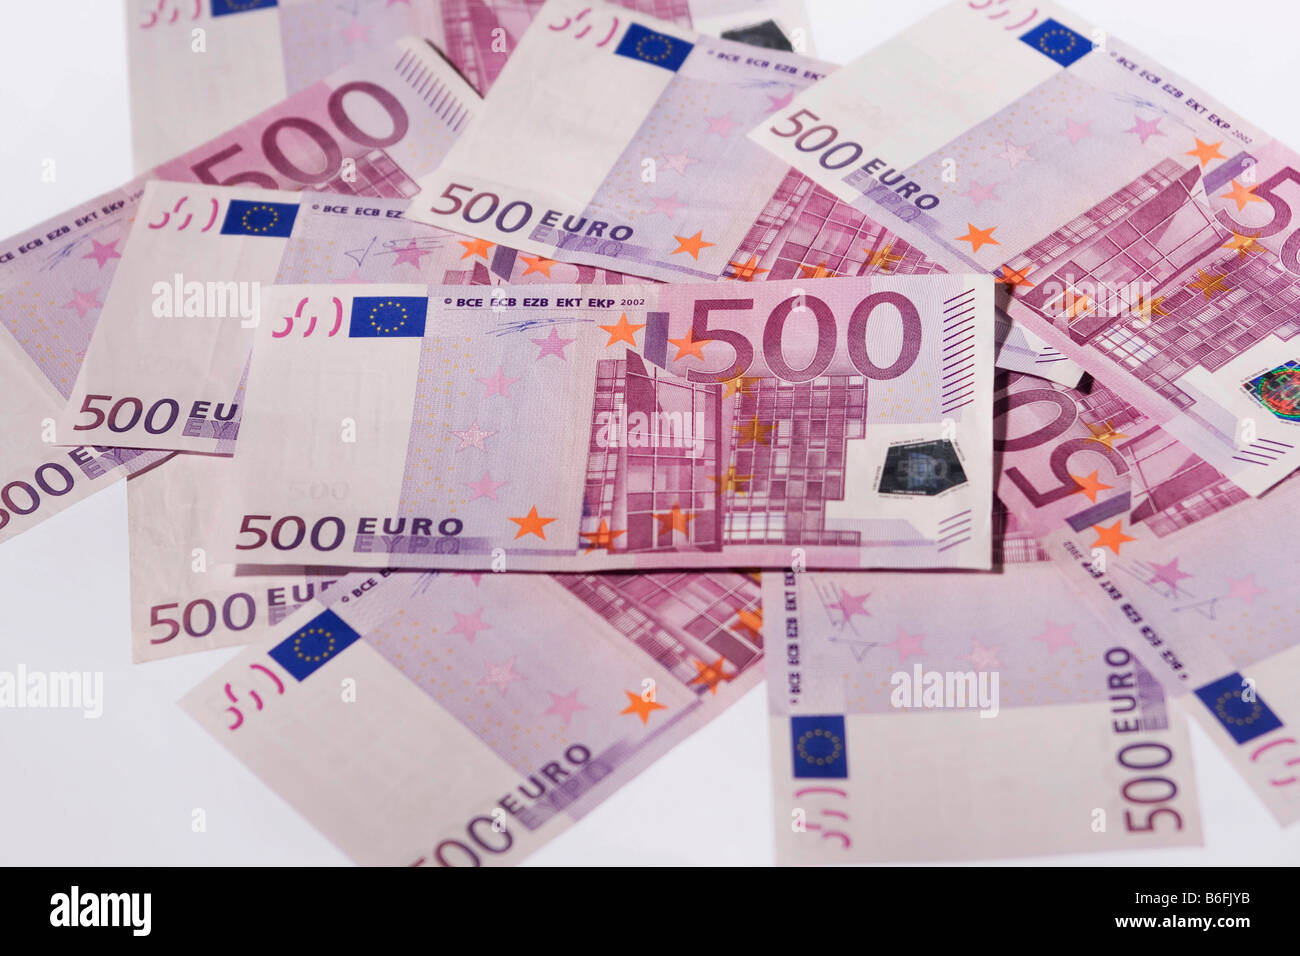 500 Euro bank notes - Stock Image